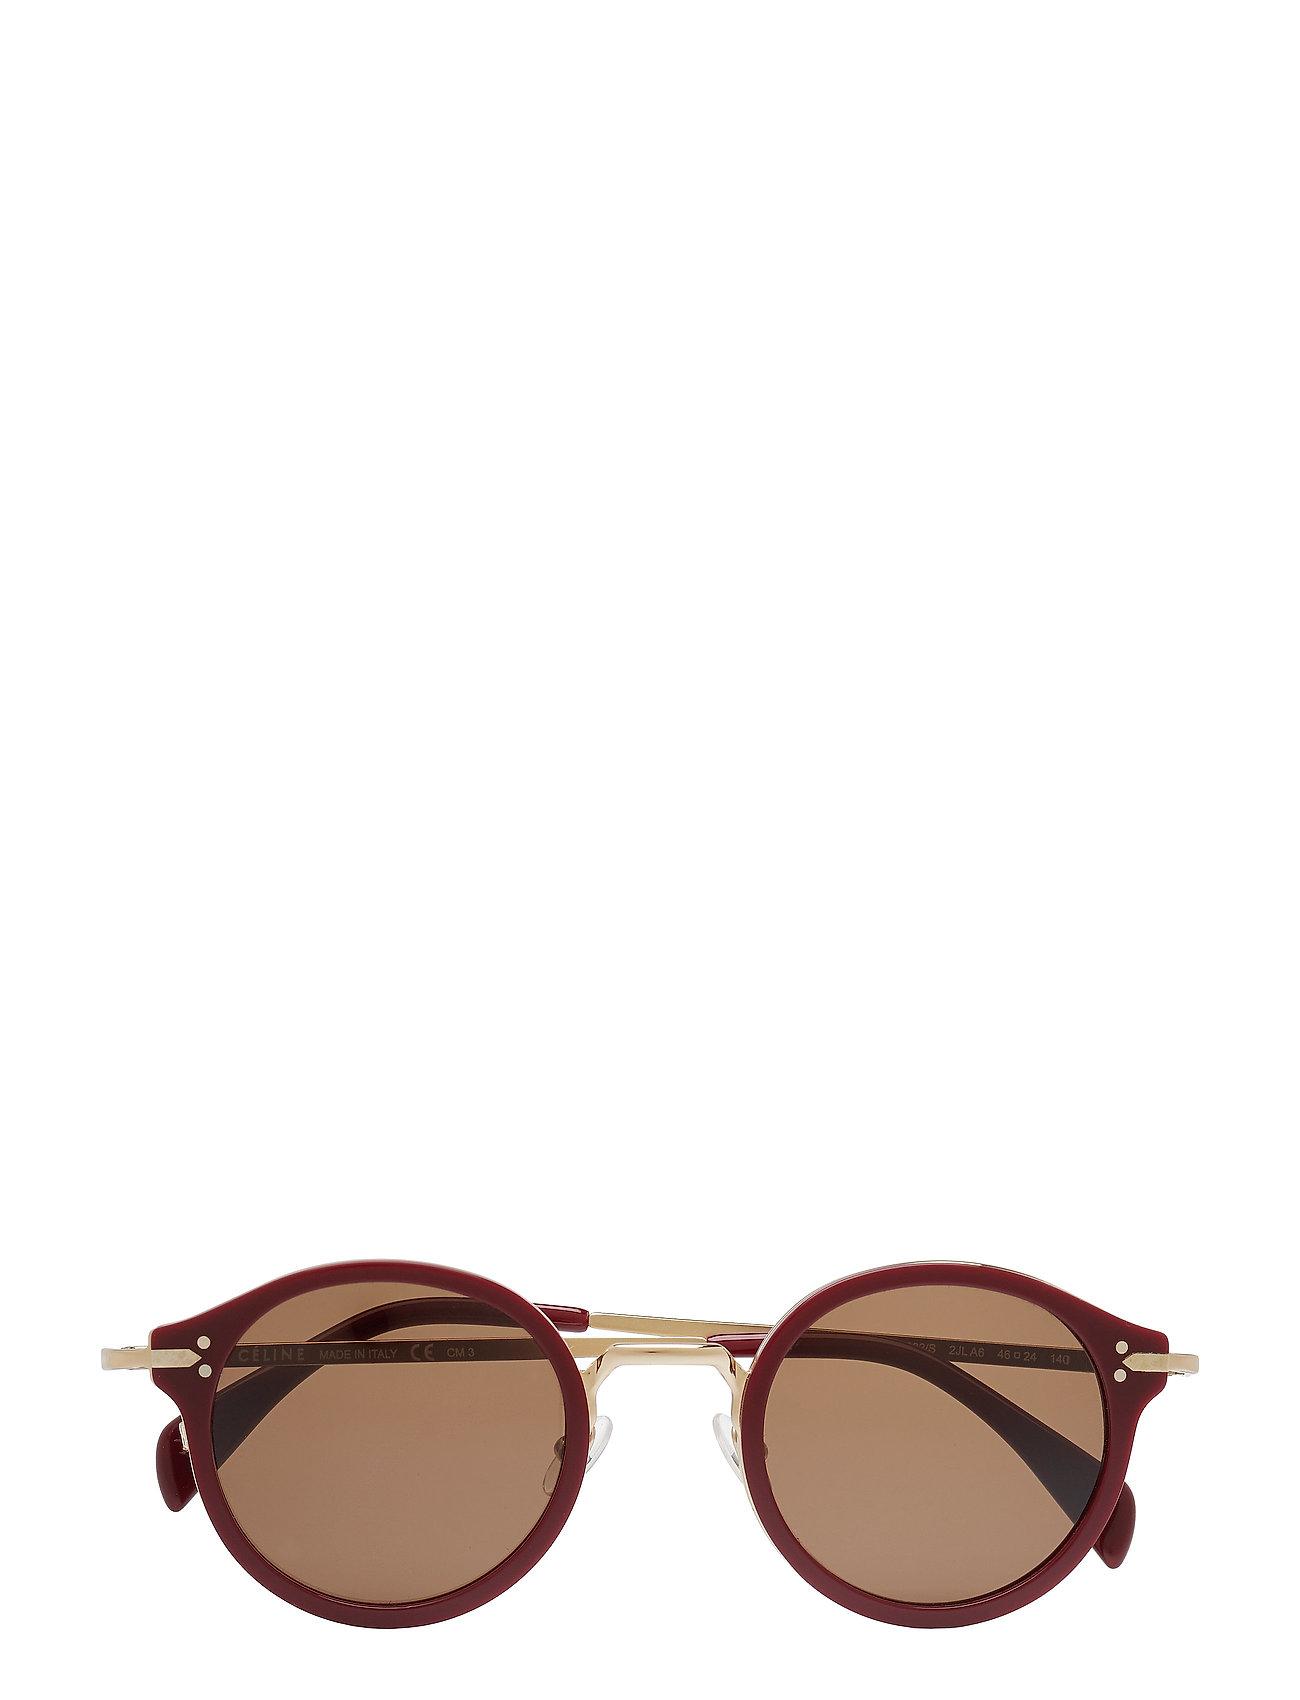 a575f84dbeb4b CELINE Sunglasses Cl 41082 s (Oplburggd)